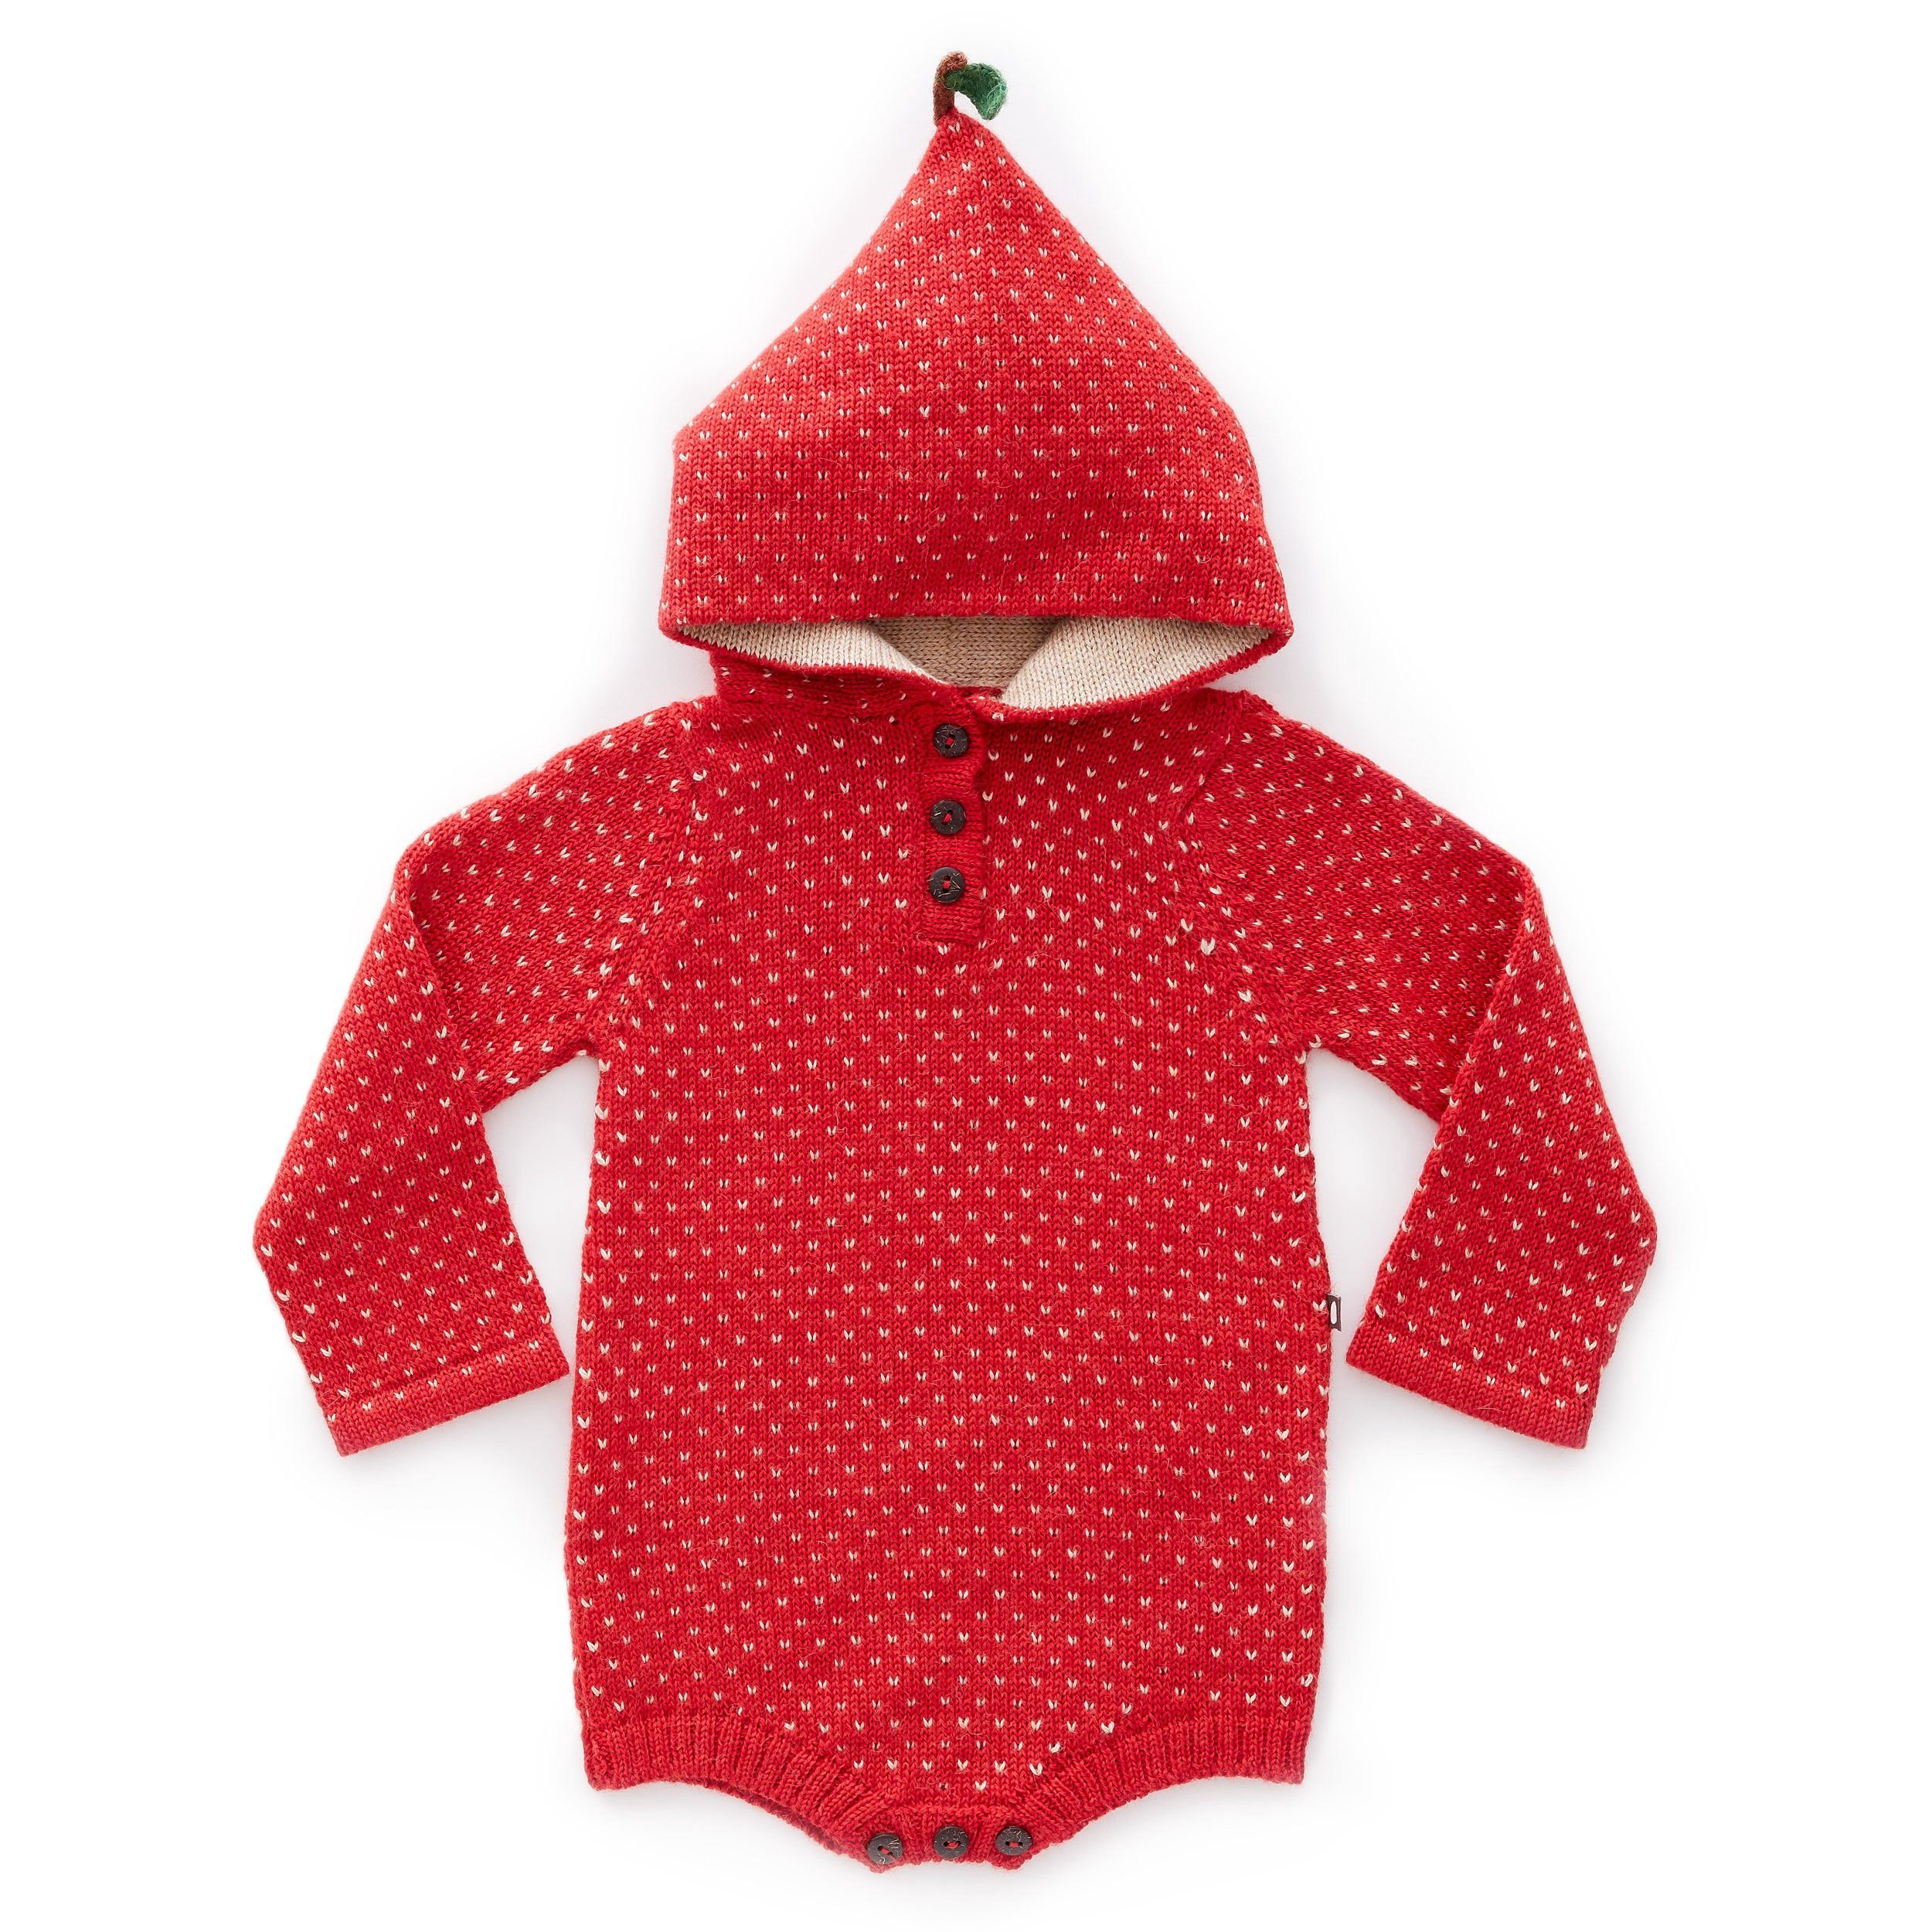 0e2ebe14b663 Oeuf Apple Hooded Onesie-Red Beige - 18M